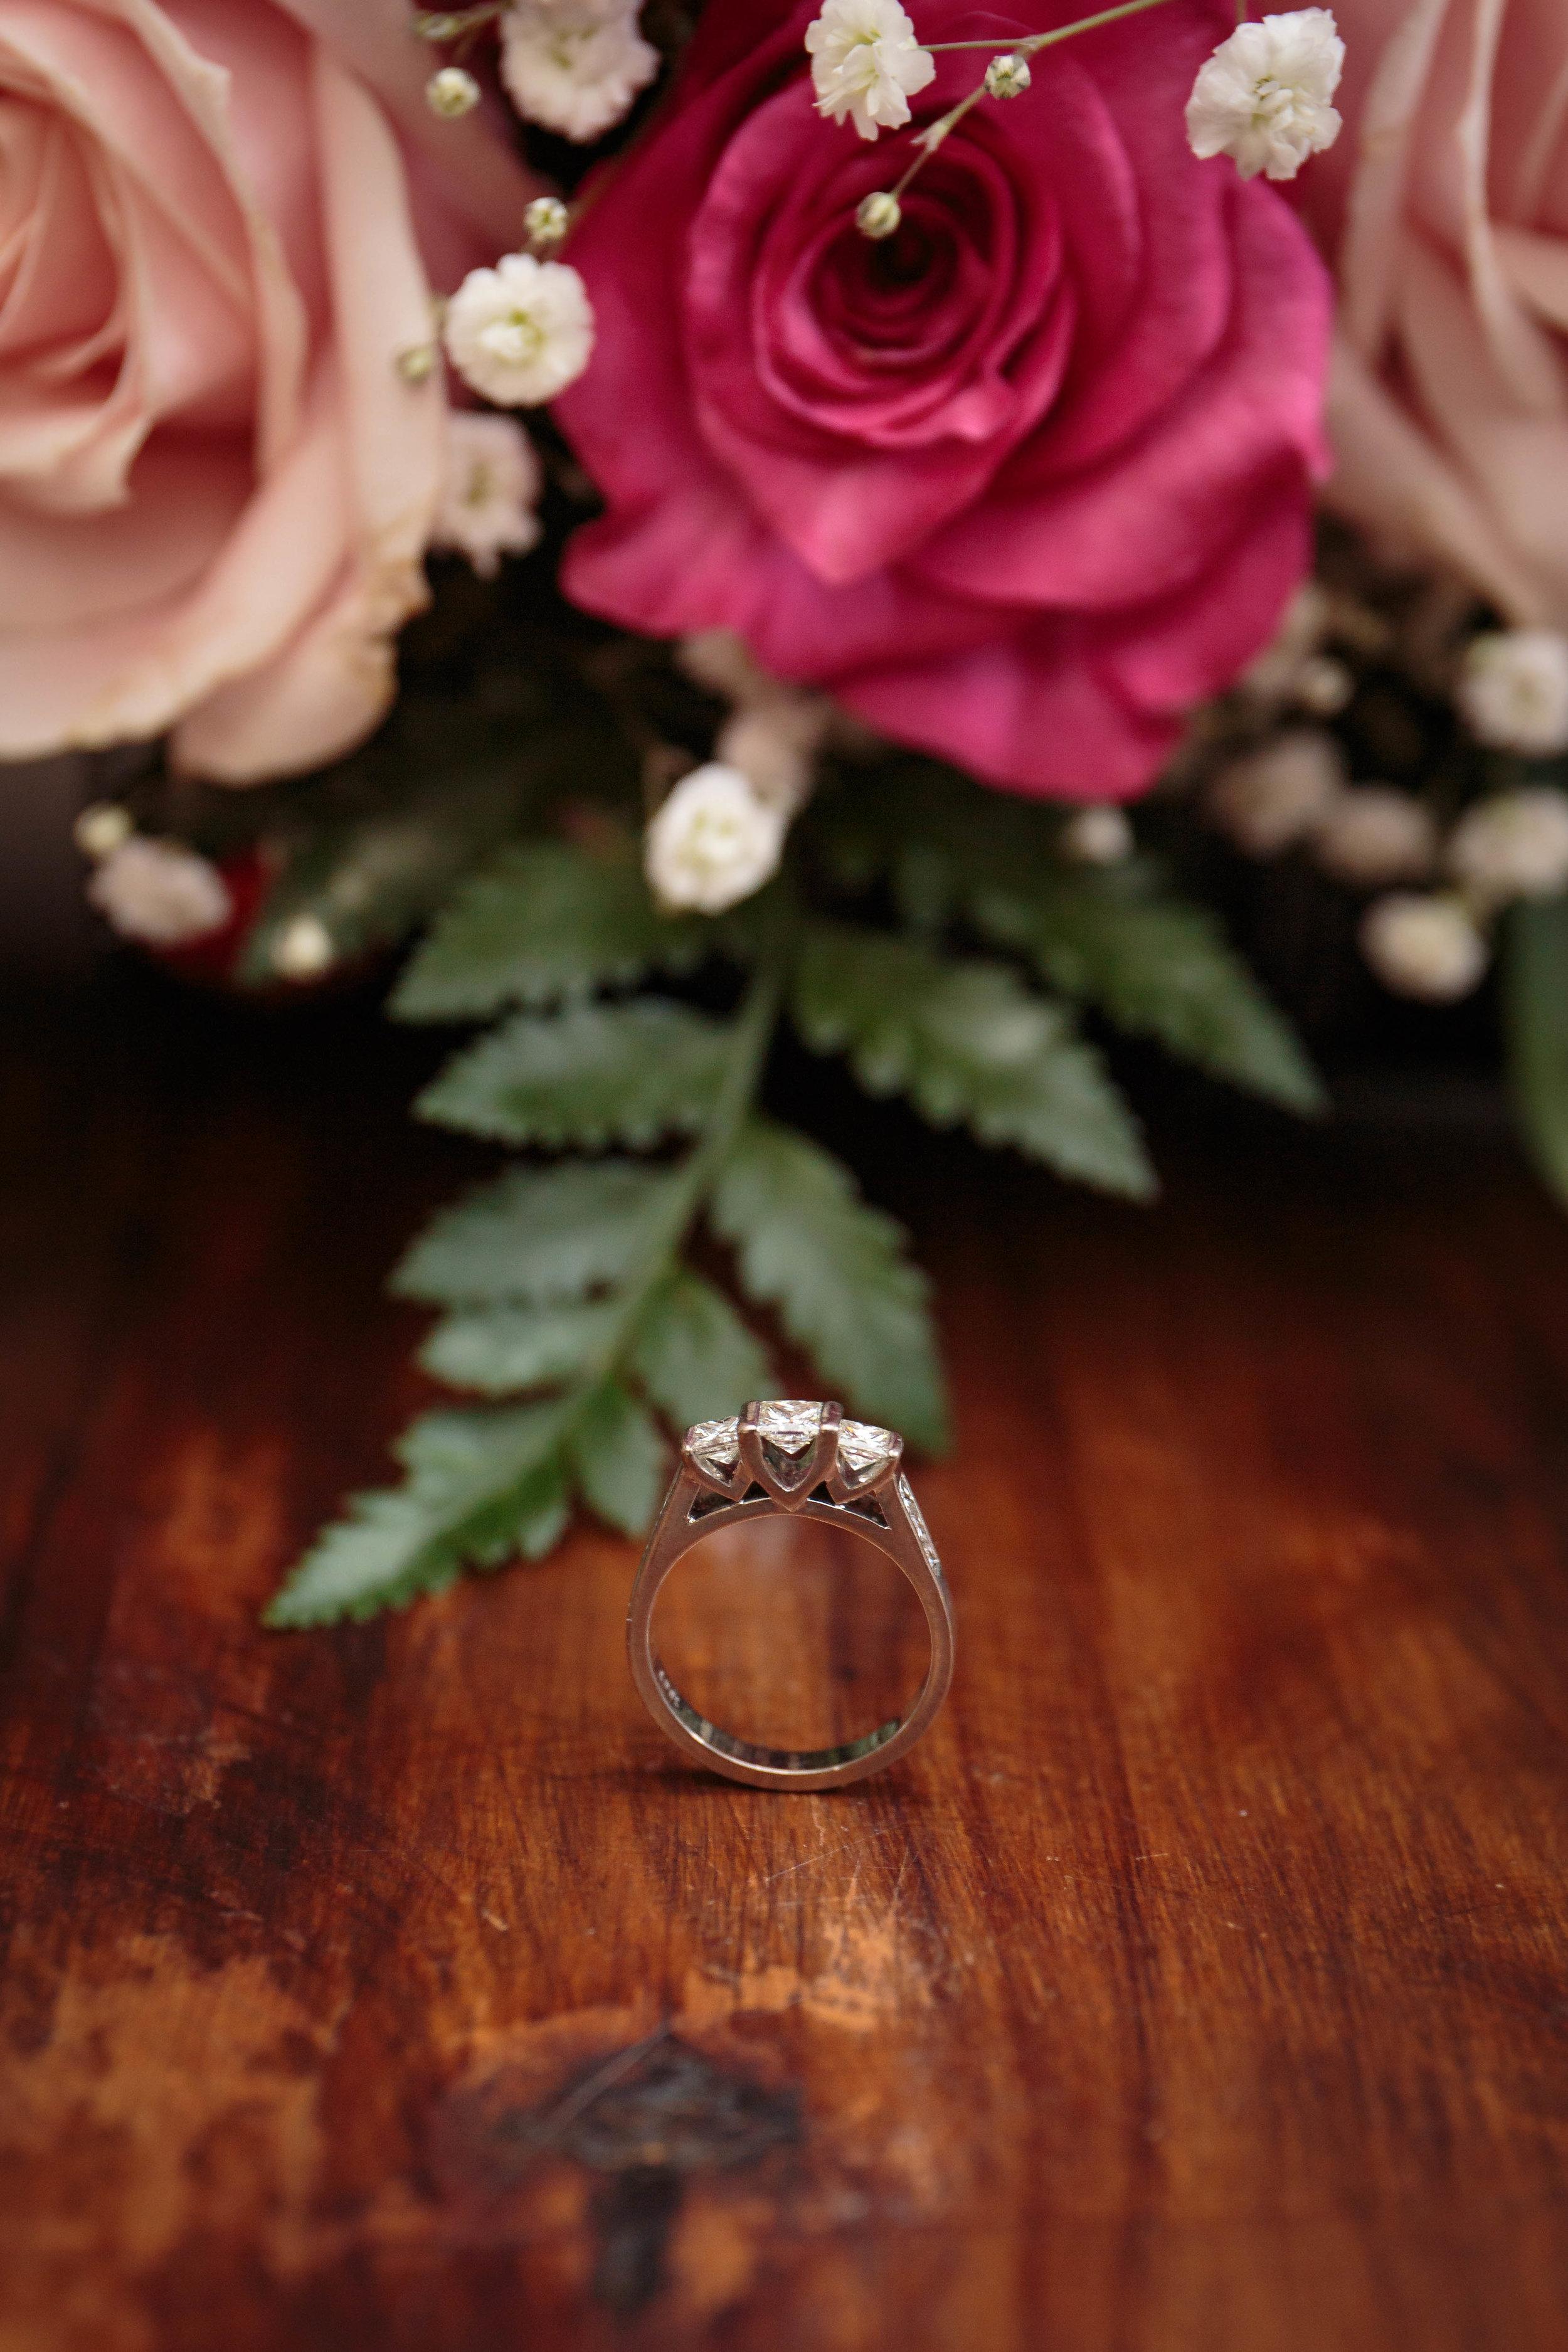 Highight-wedding-photography-dudding-lake-palmerston-north-new-zealand-4.jpg